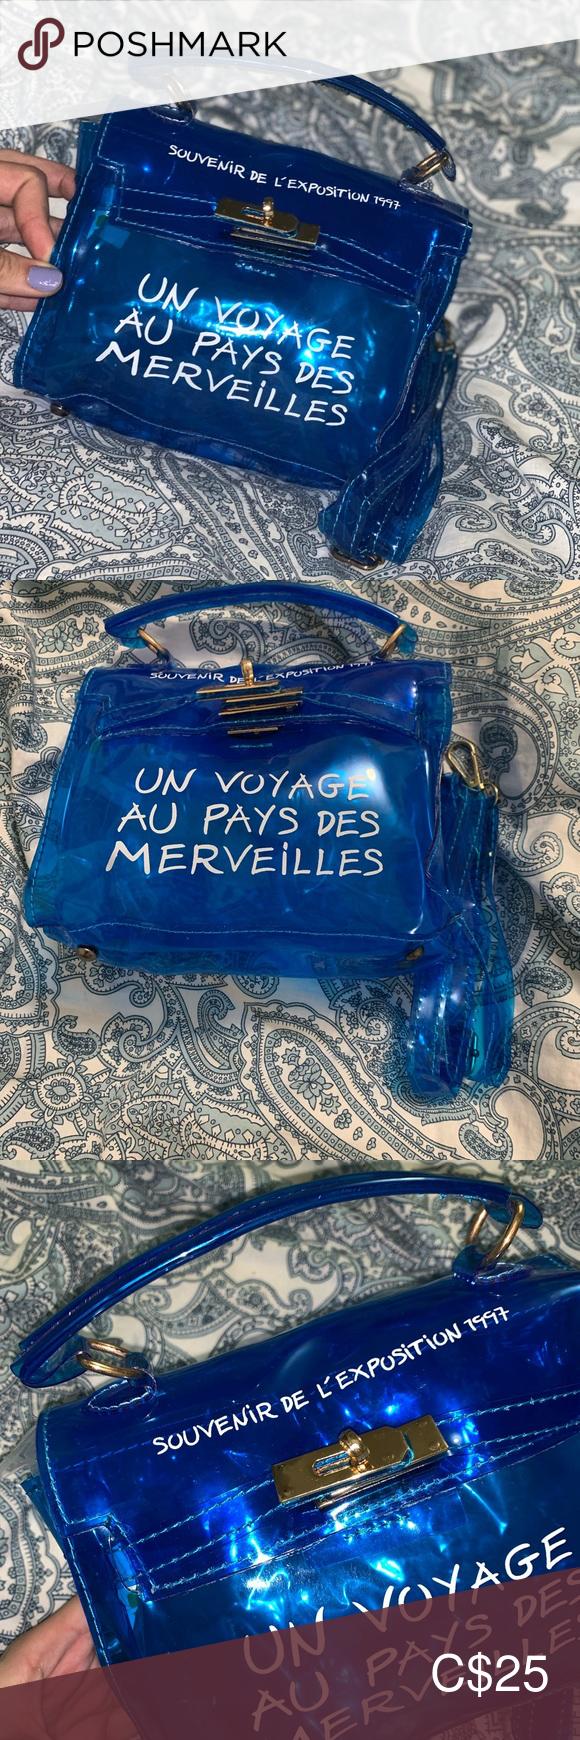 clear blue jelly small crossbody purse small crossbody purse purses crossbody small crossbody pinterest